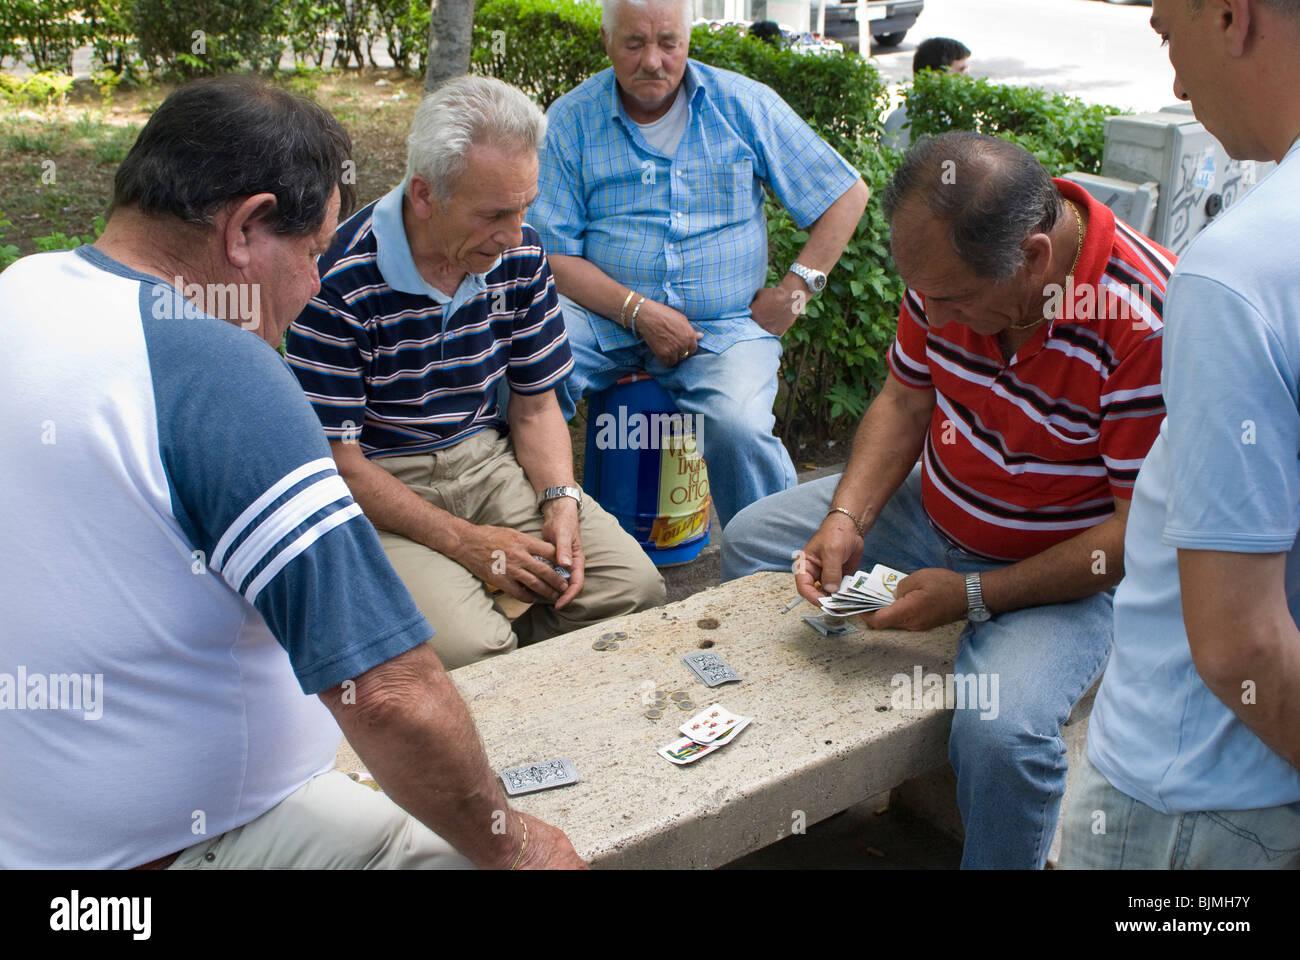 Italien, Sizilien, Palermo, alte Männer spielen Karten im Park | Italy, Sicily, Palermo, old men playing cards - Stock Image